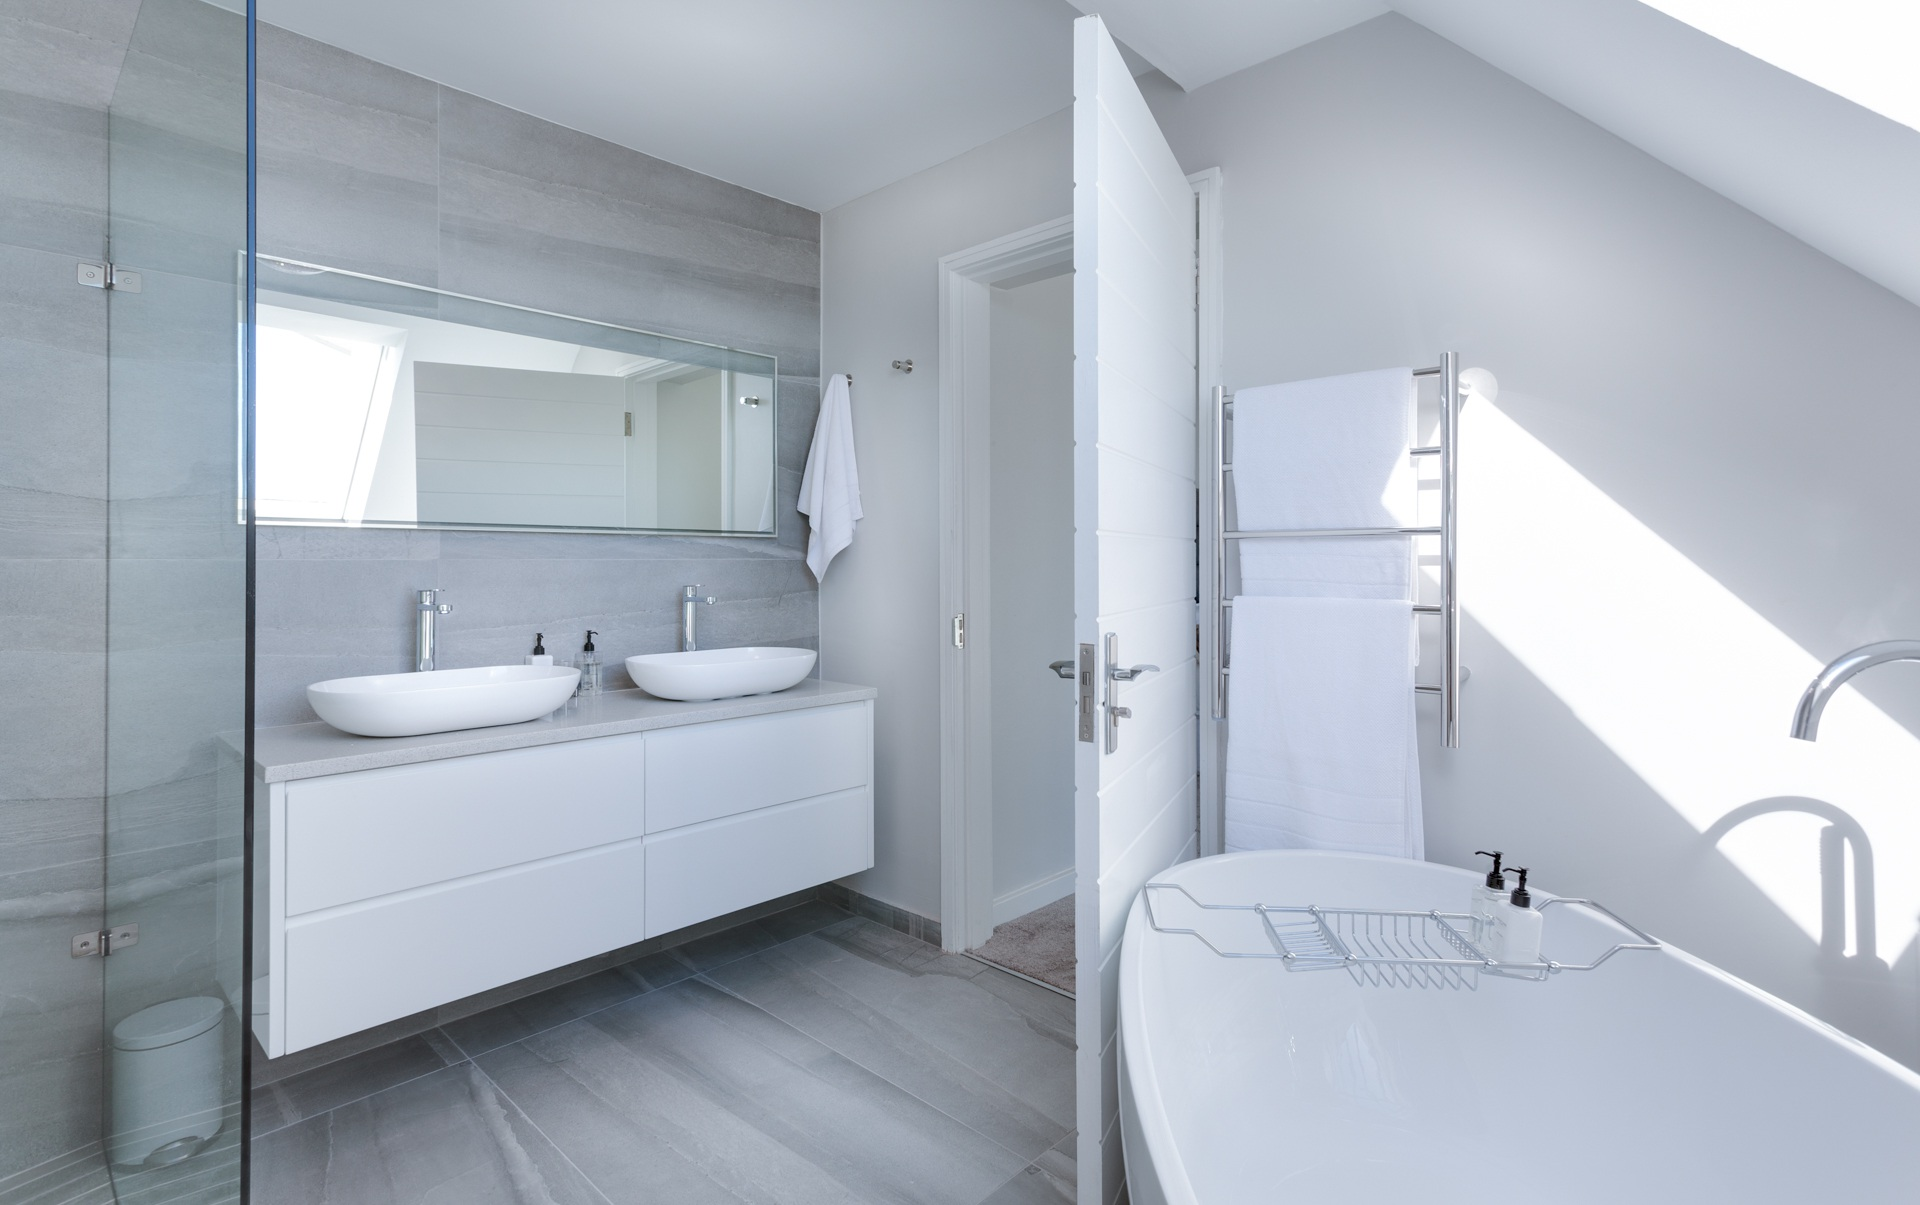 Bathroom Kitchen Remodeling Glen Ellyn Proinstall Construction